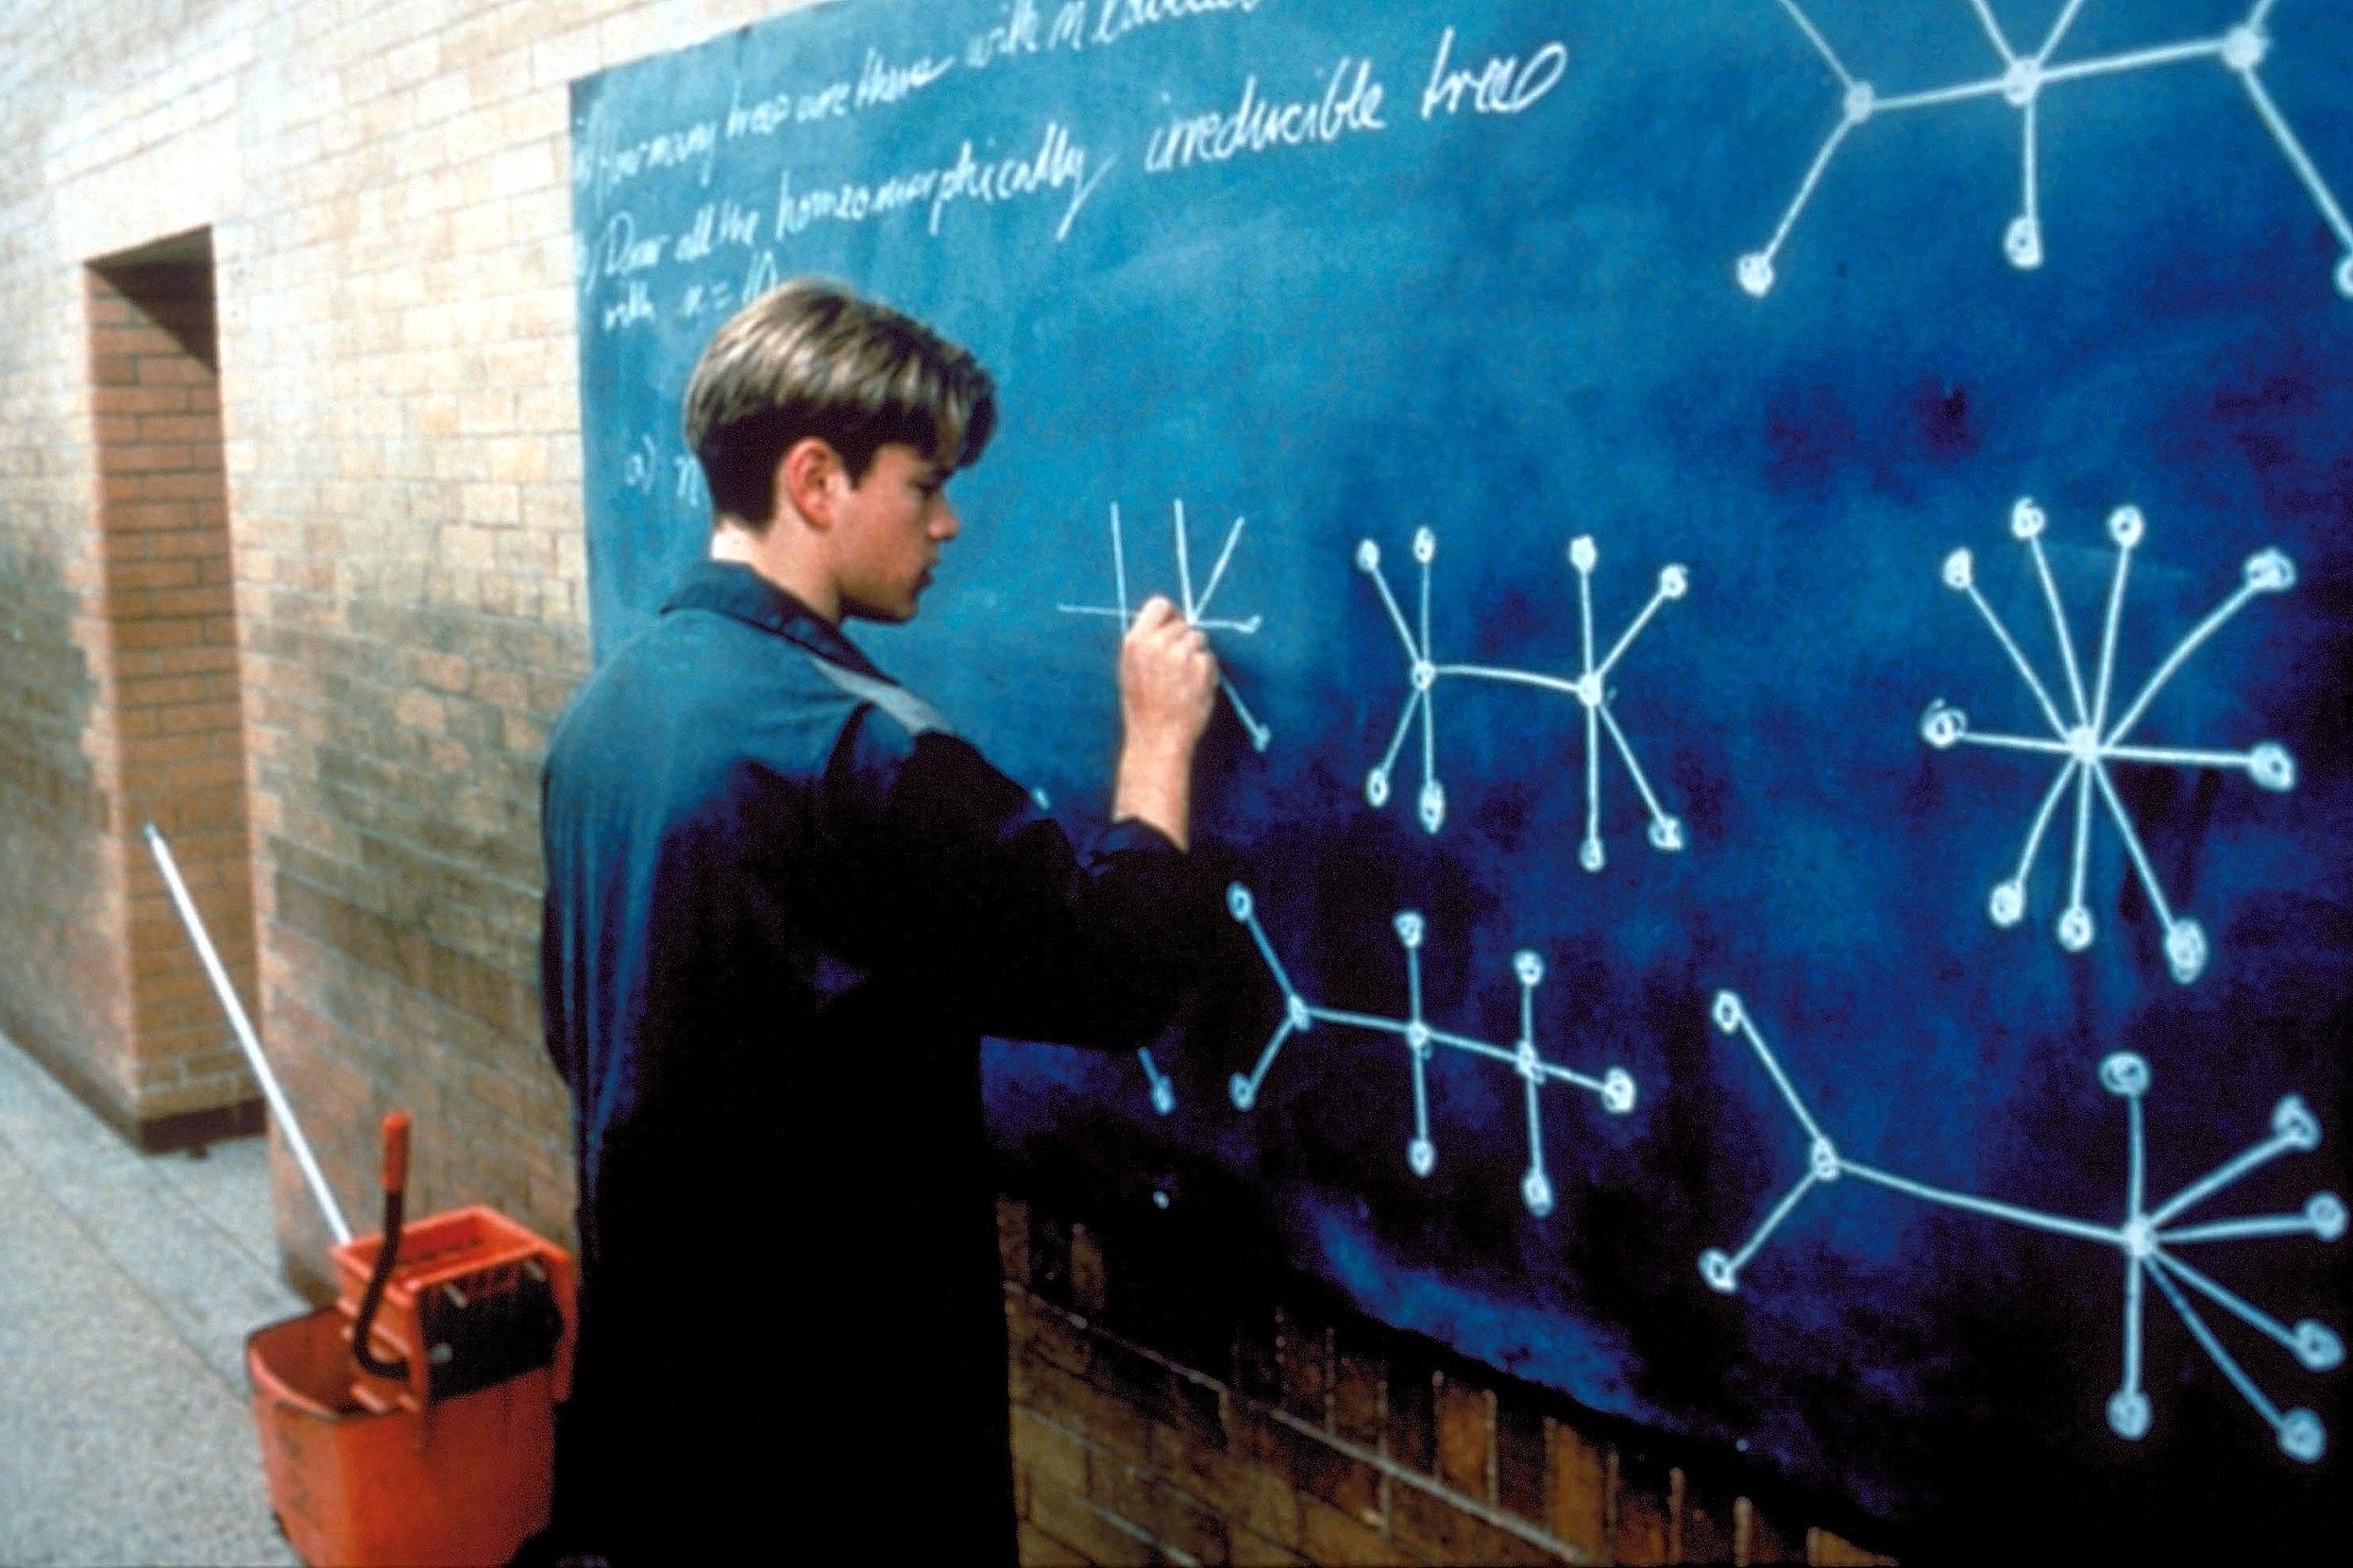 Good Will Hunting (1997) - Directed by: Gus Van SantWritten by: Matt Damon & Ben Affleck